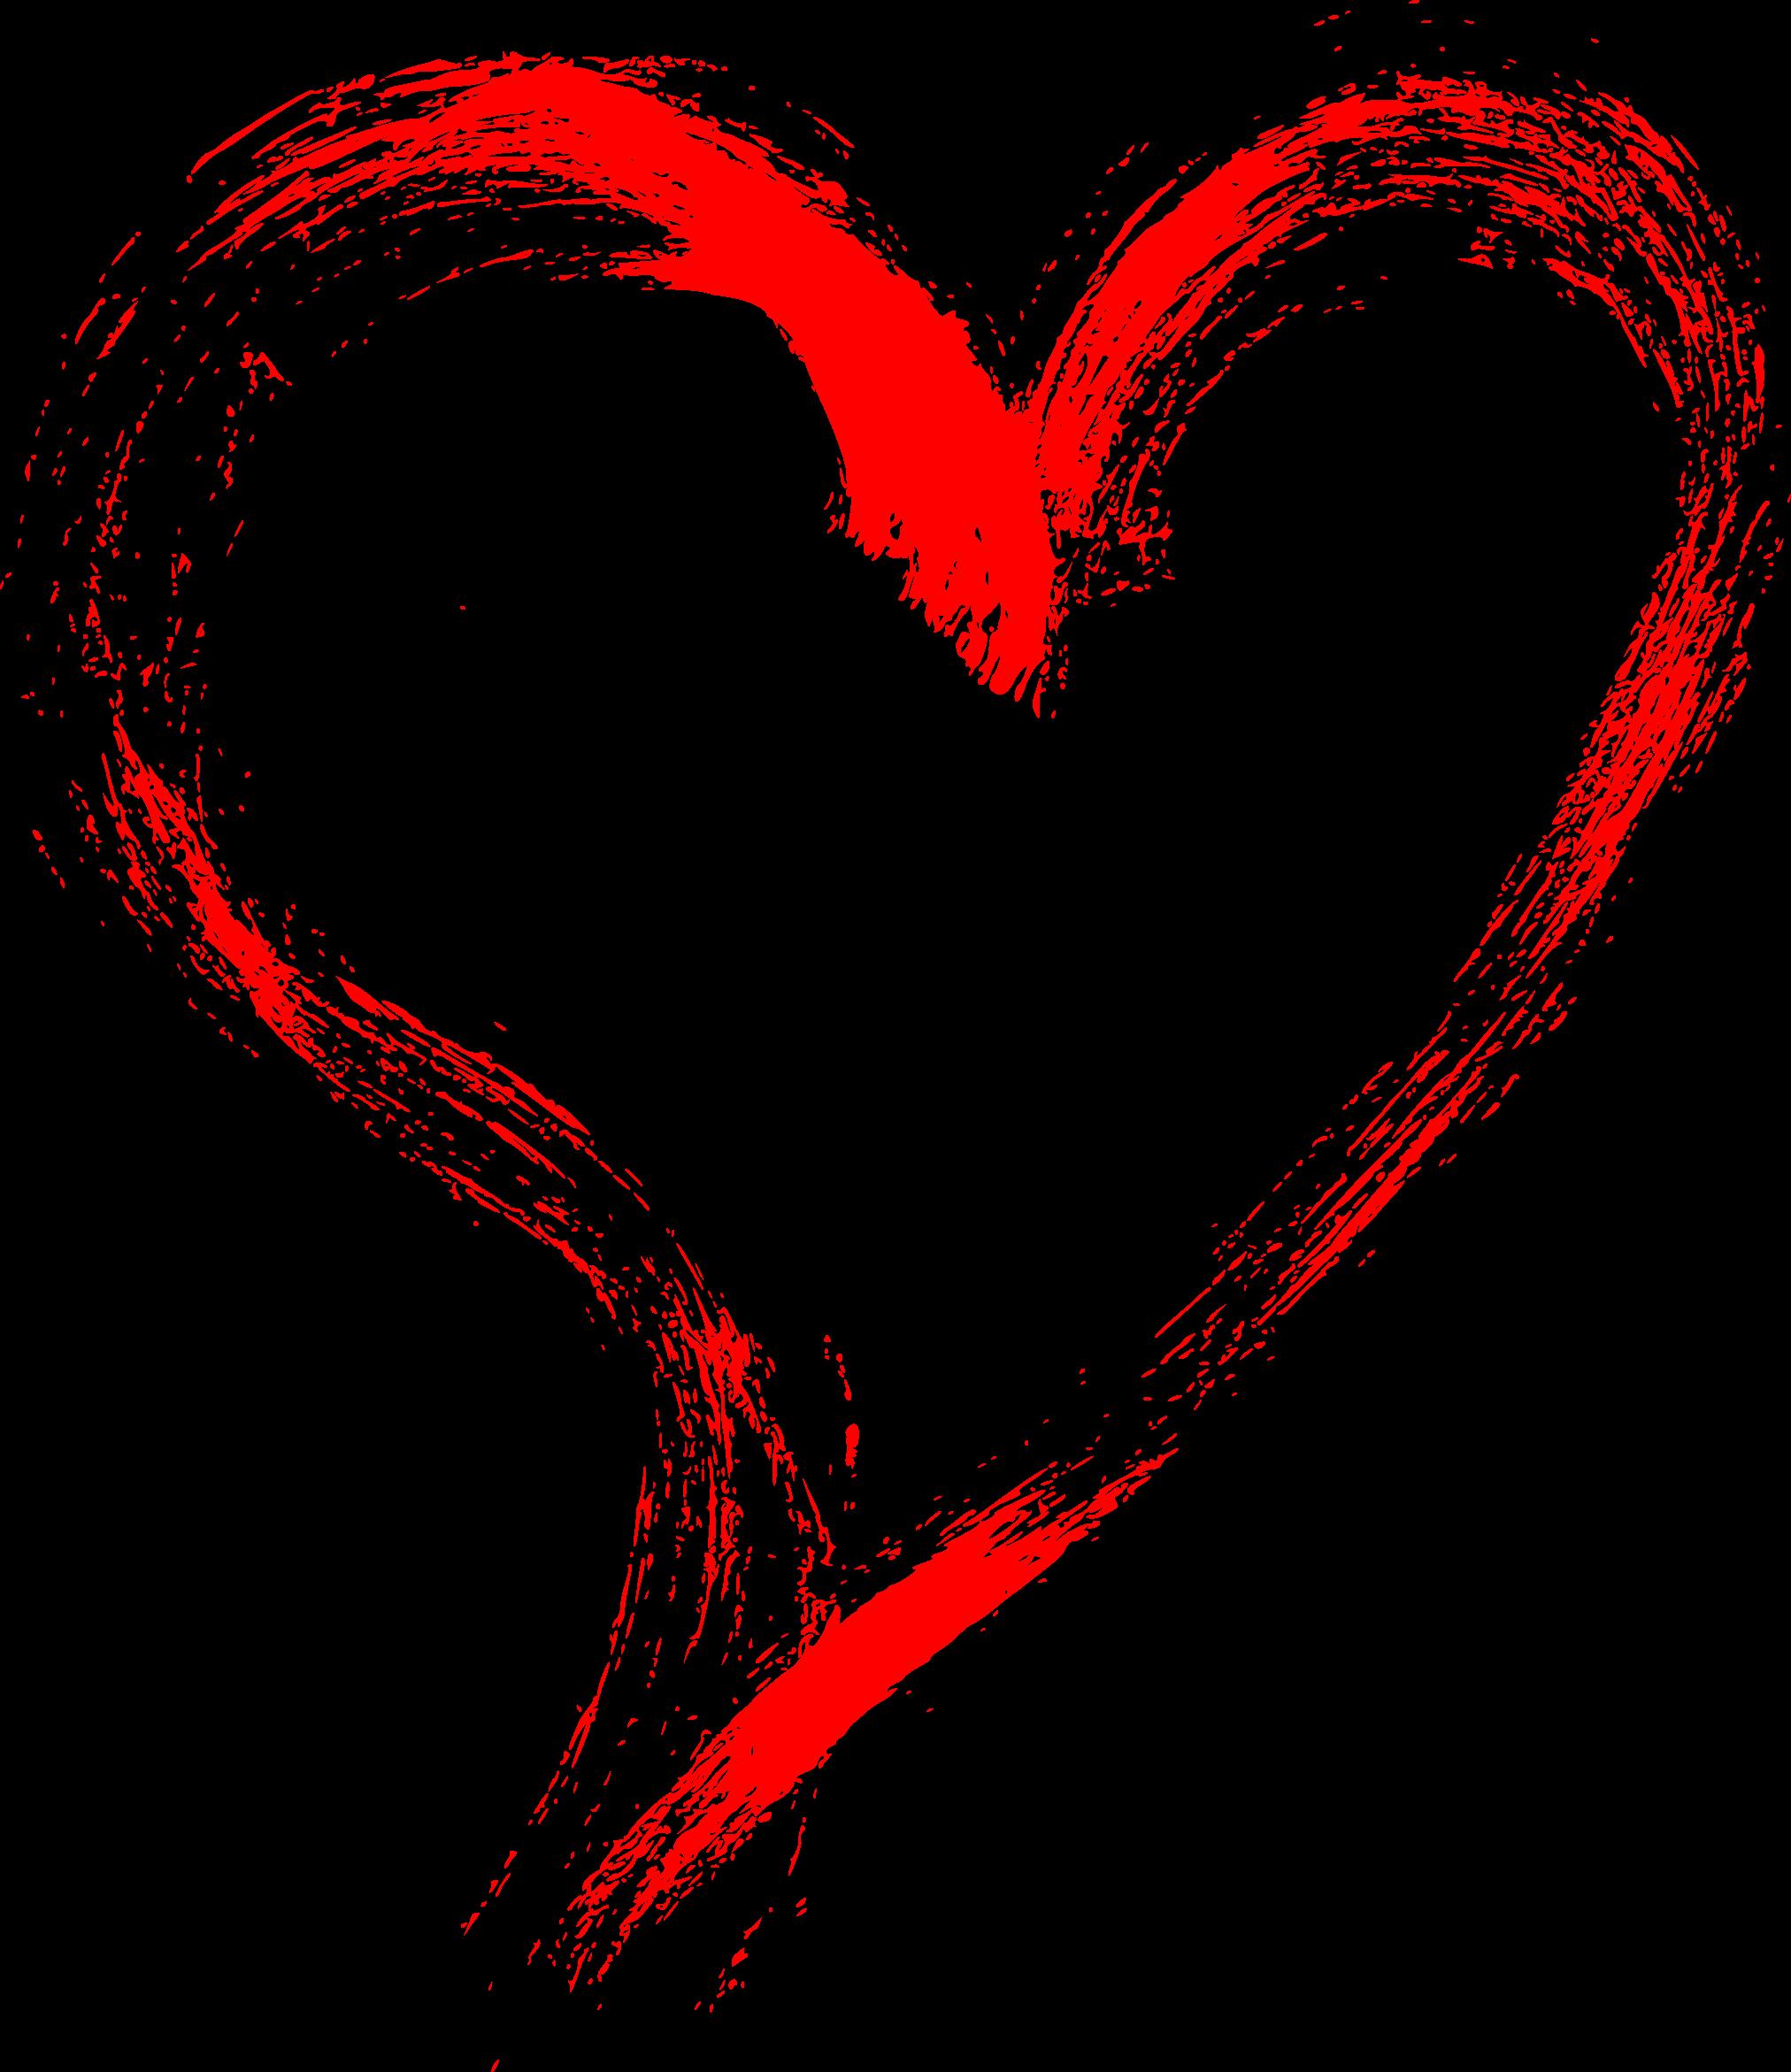 10 Red Grunge Brush Stroke Heart (PNG Transparent).